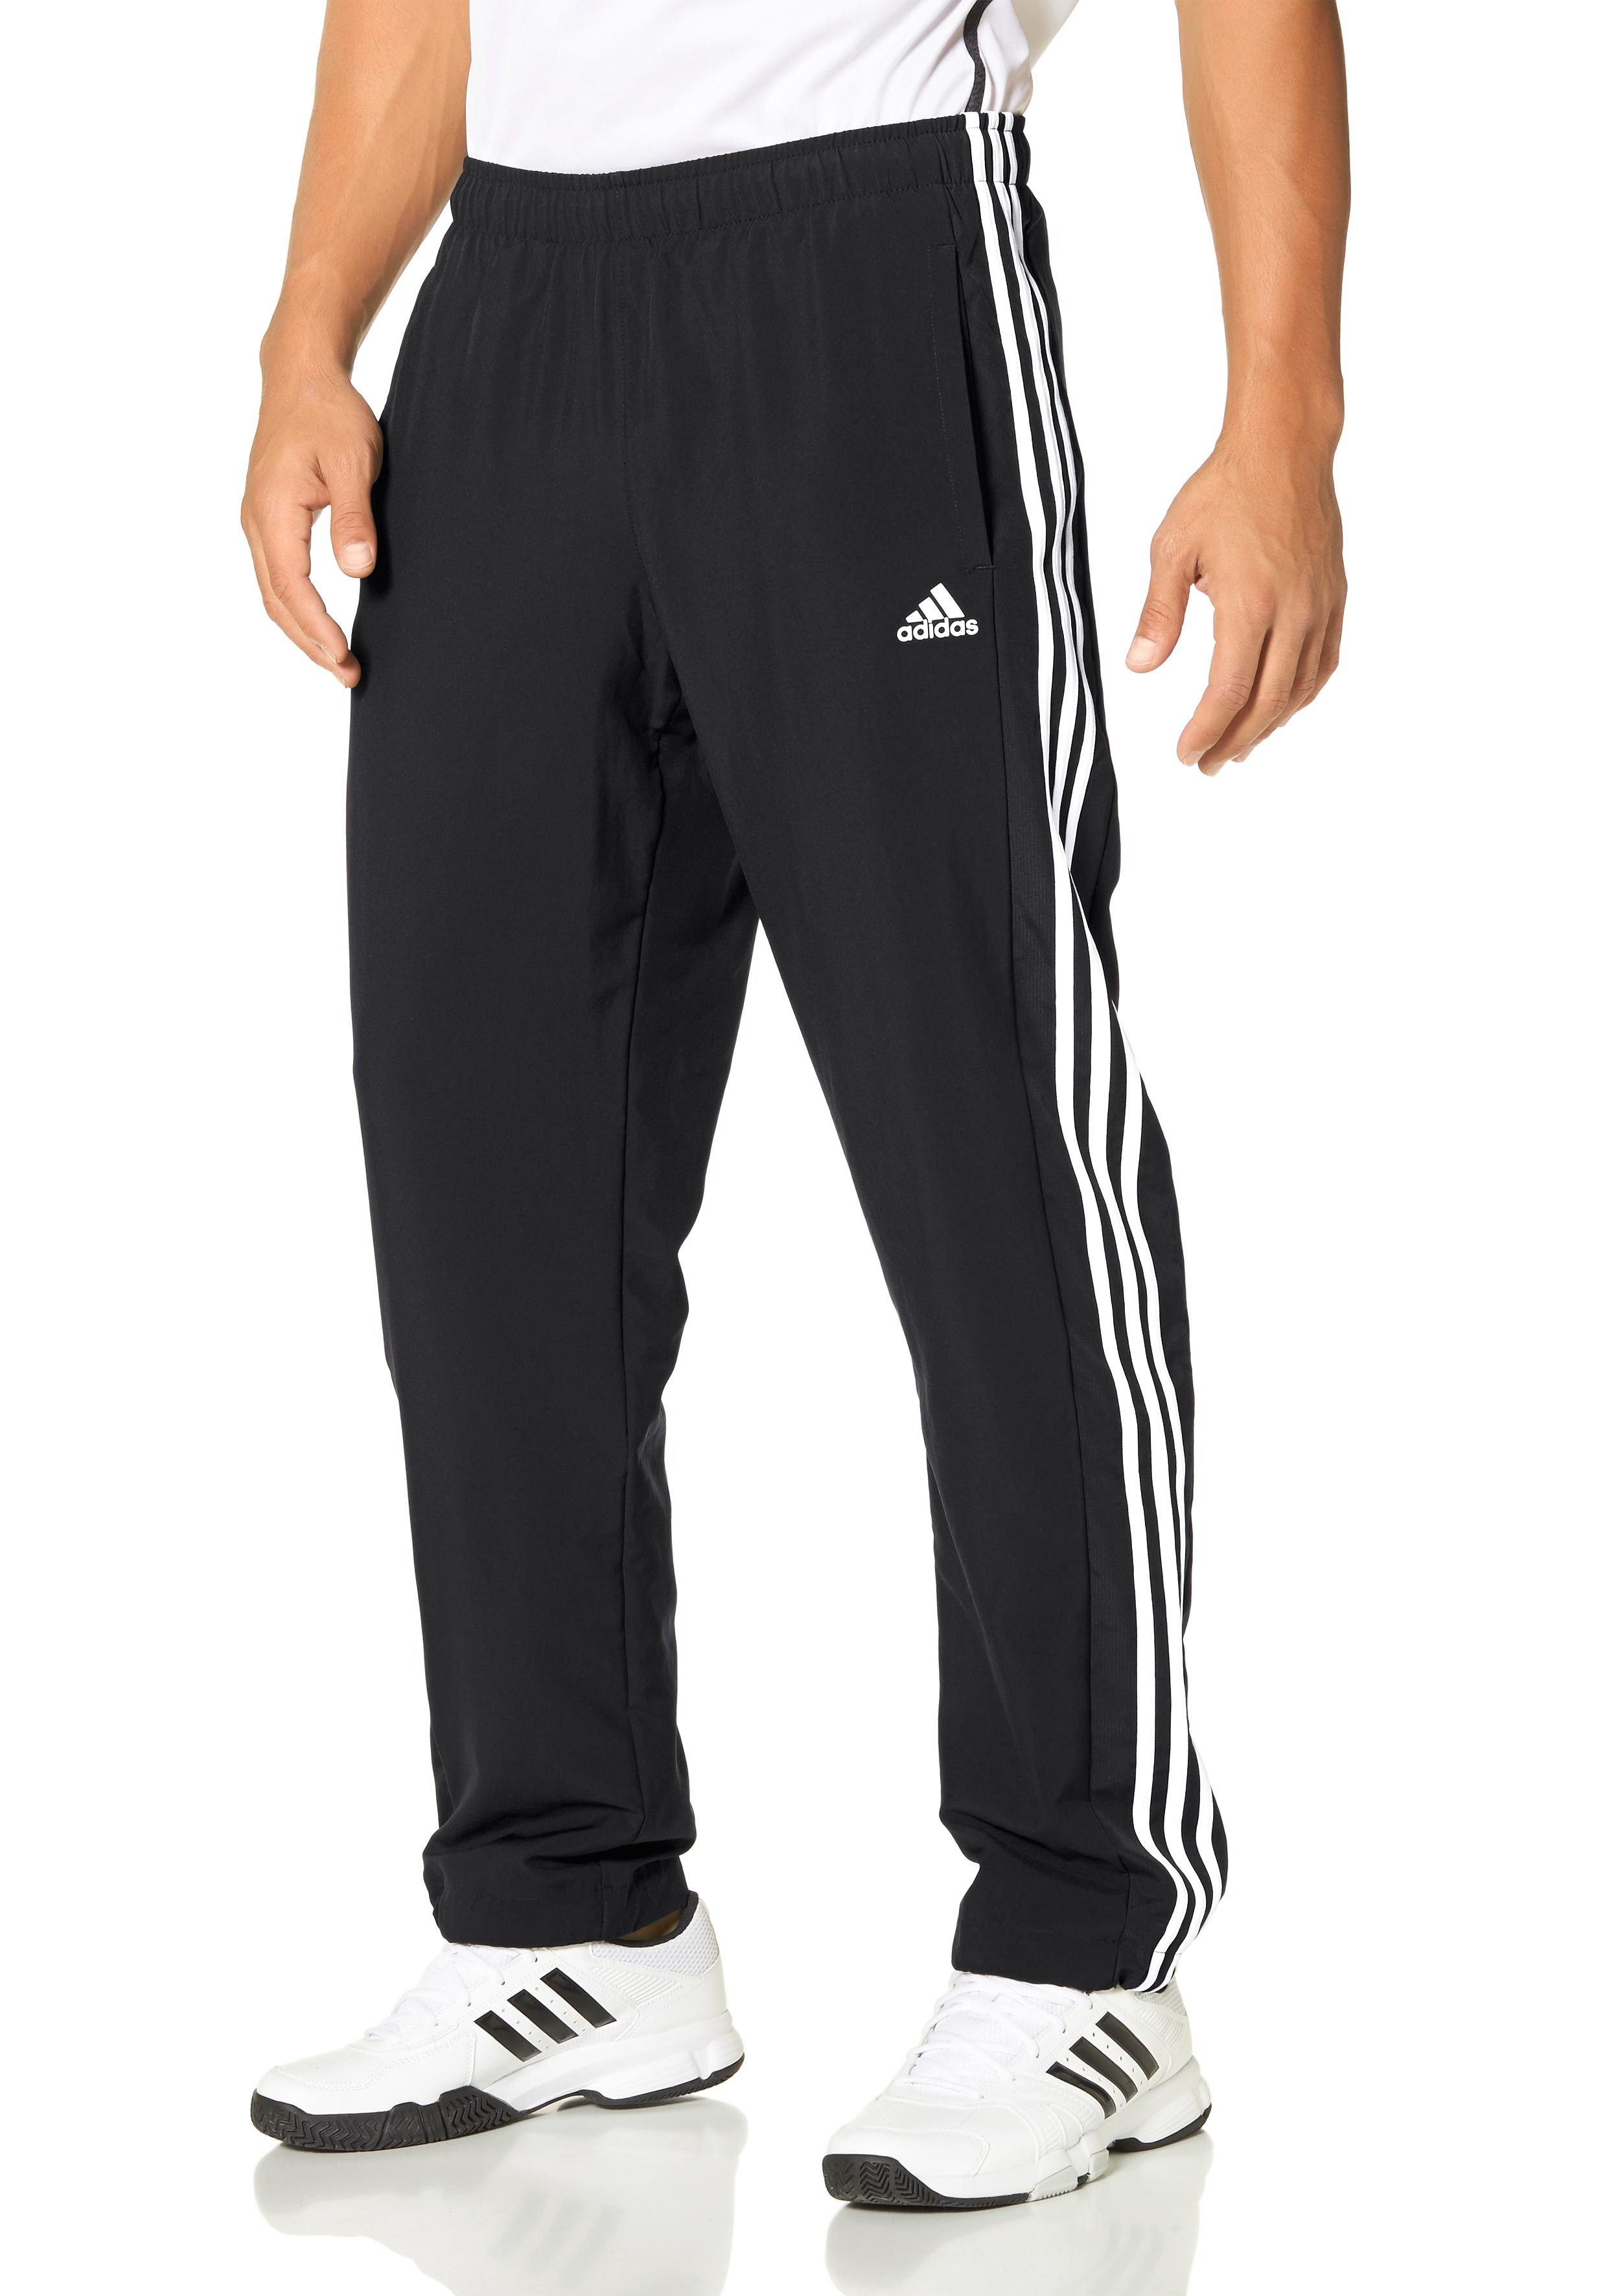 adidas Essentials Adidas Pantalon Performance Essentials vm8Nwn0